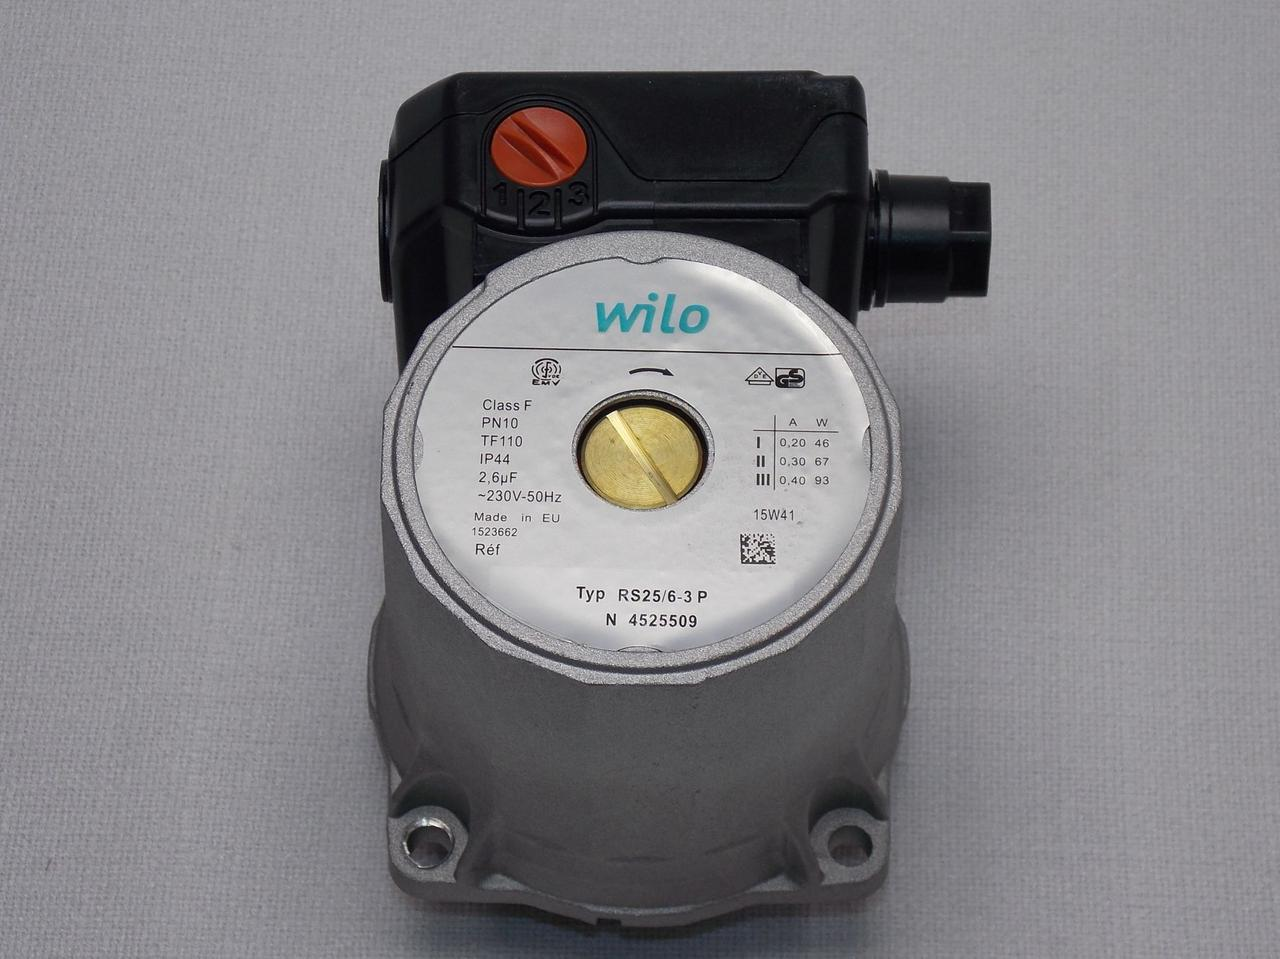 Циркуляционный насос Wilo RS 25 6-3-Р